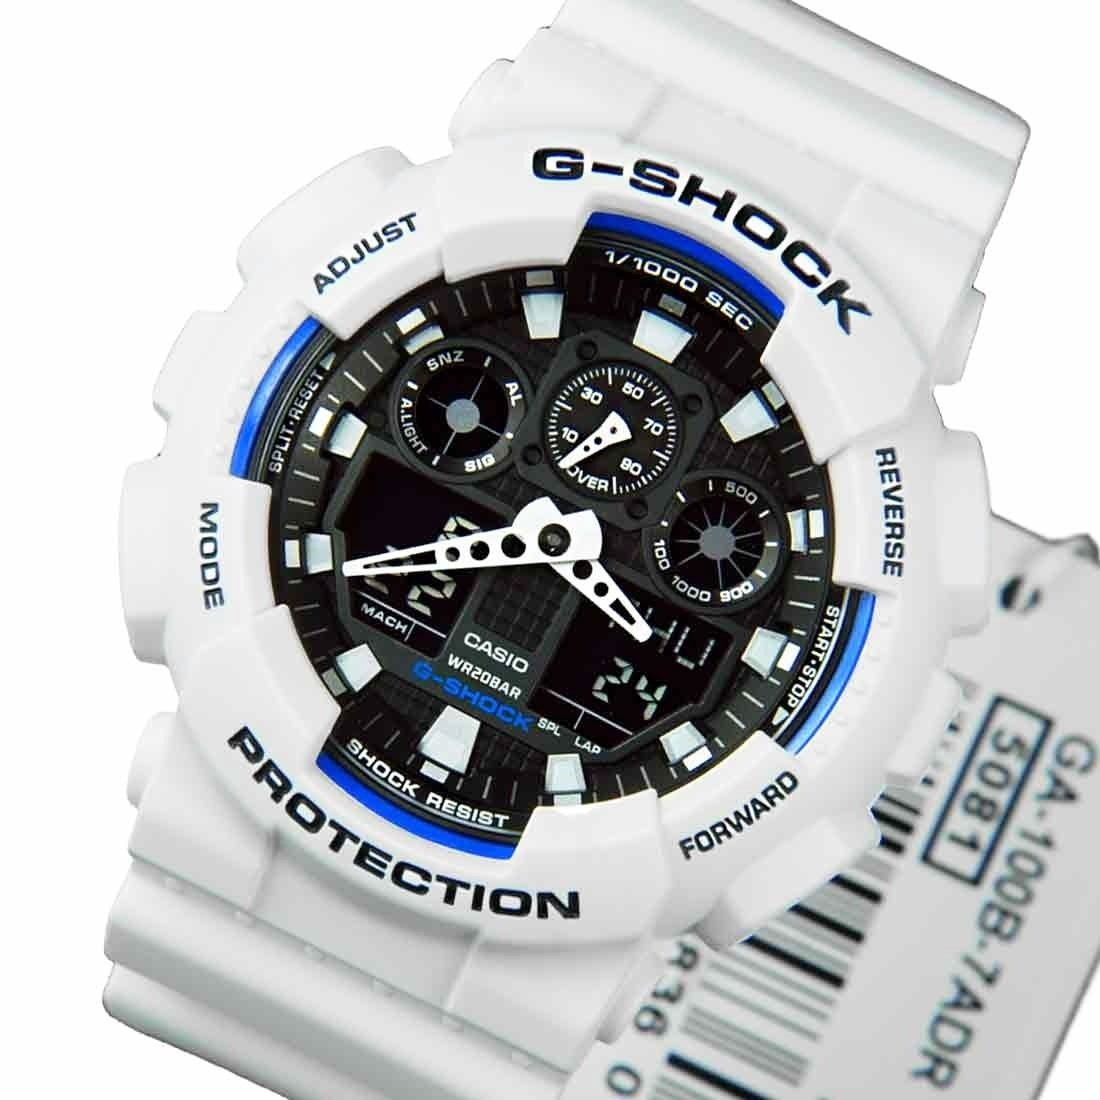 91ff9be78399 reloj casio g-shock ga100b-7a en stock original genuino. Cargando zoom.